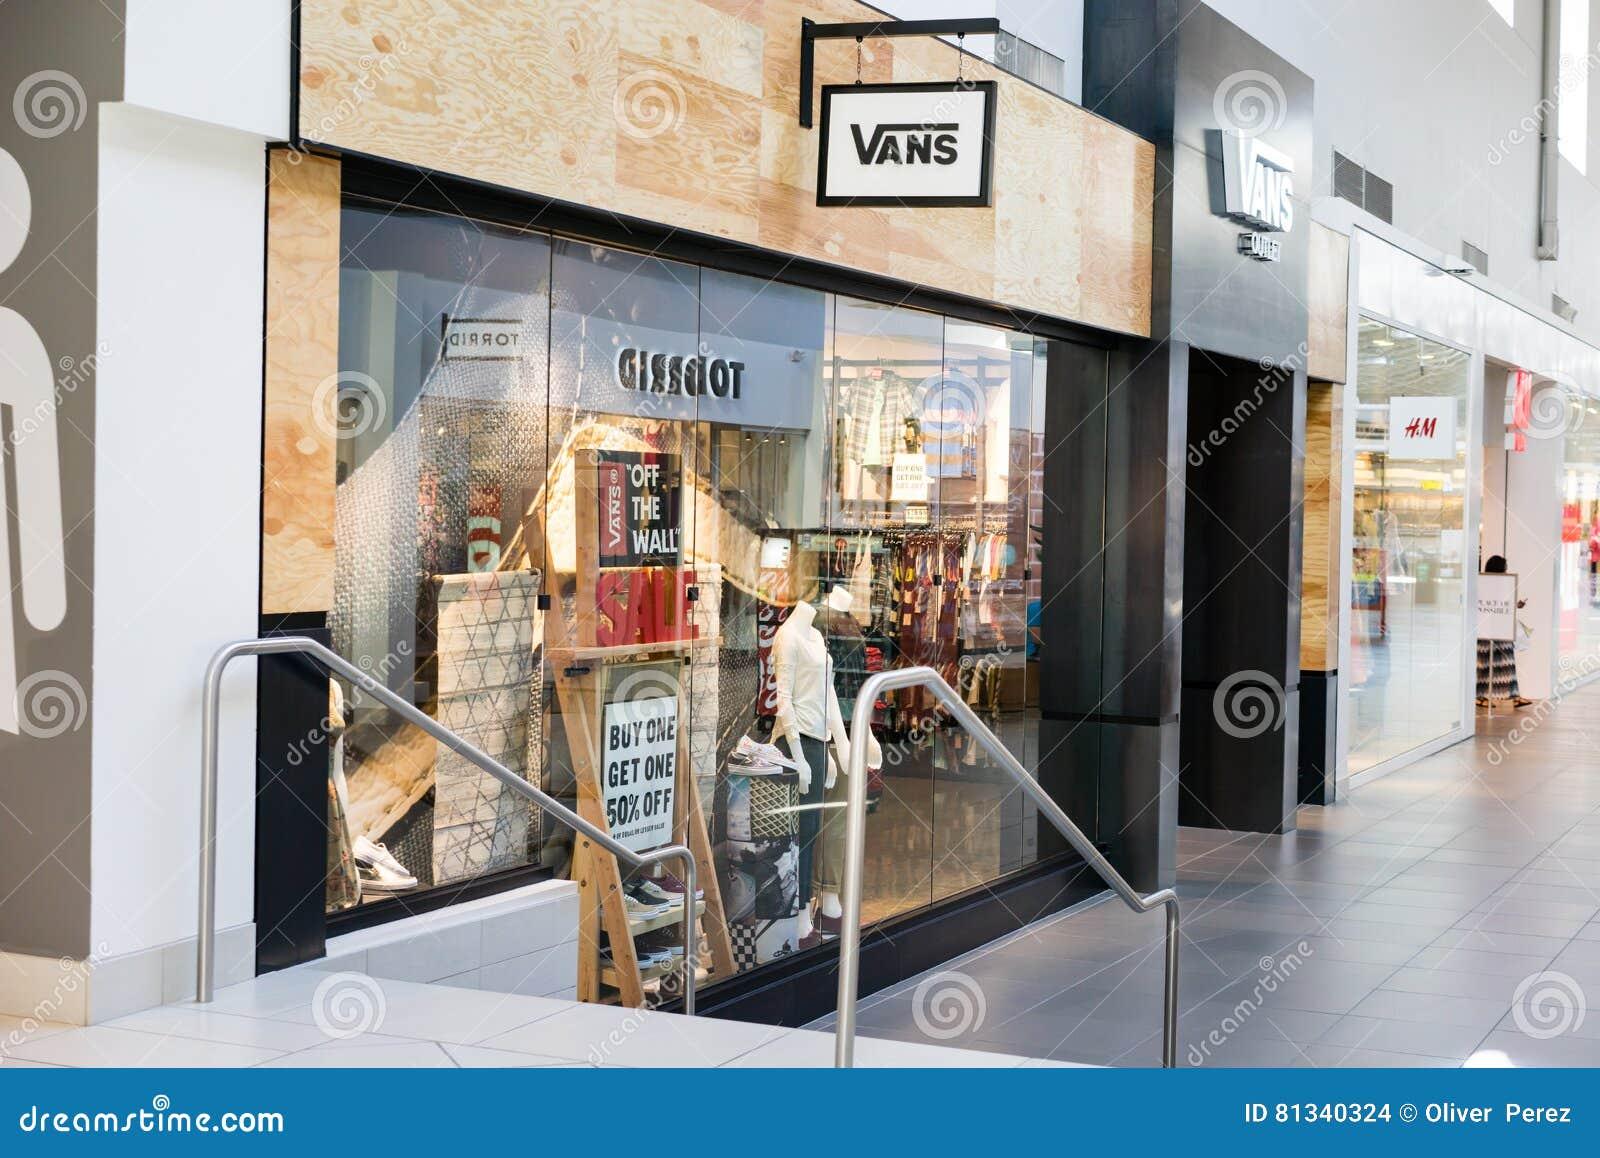 Vans shoe store editorial stock image